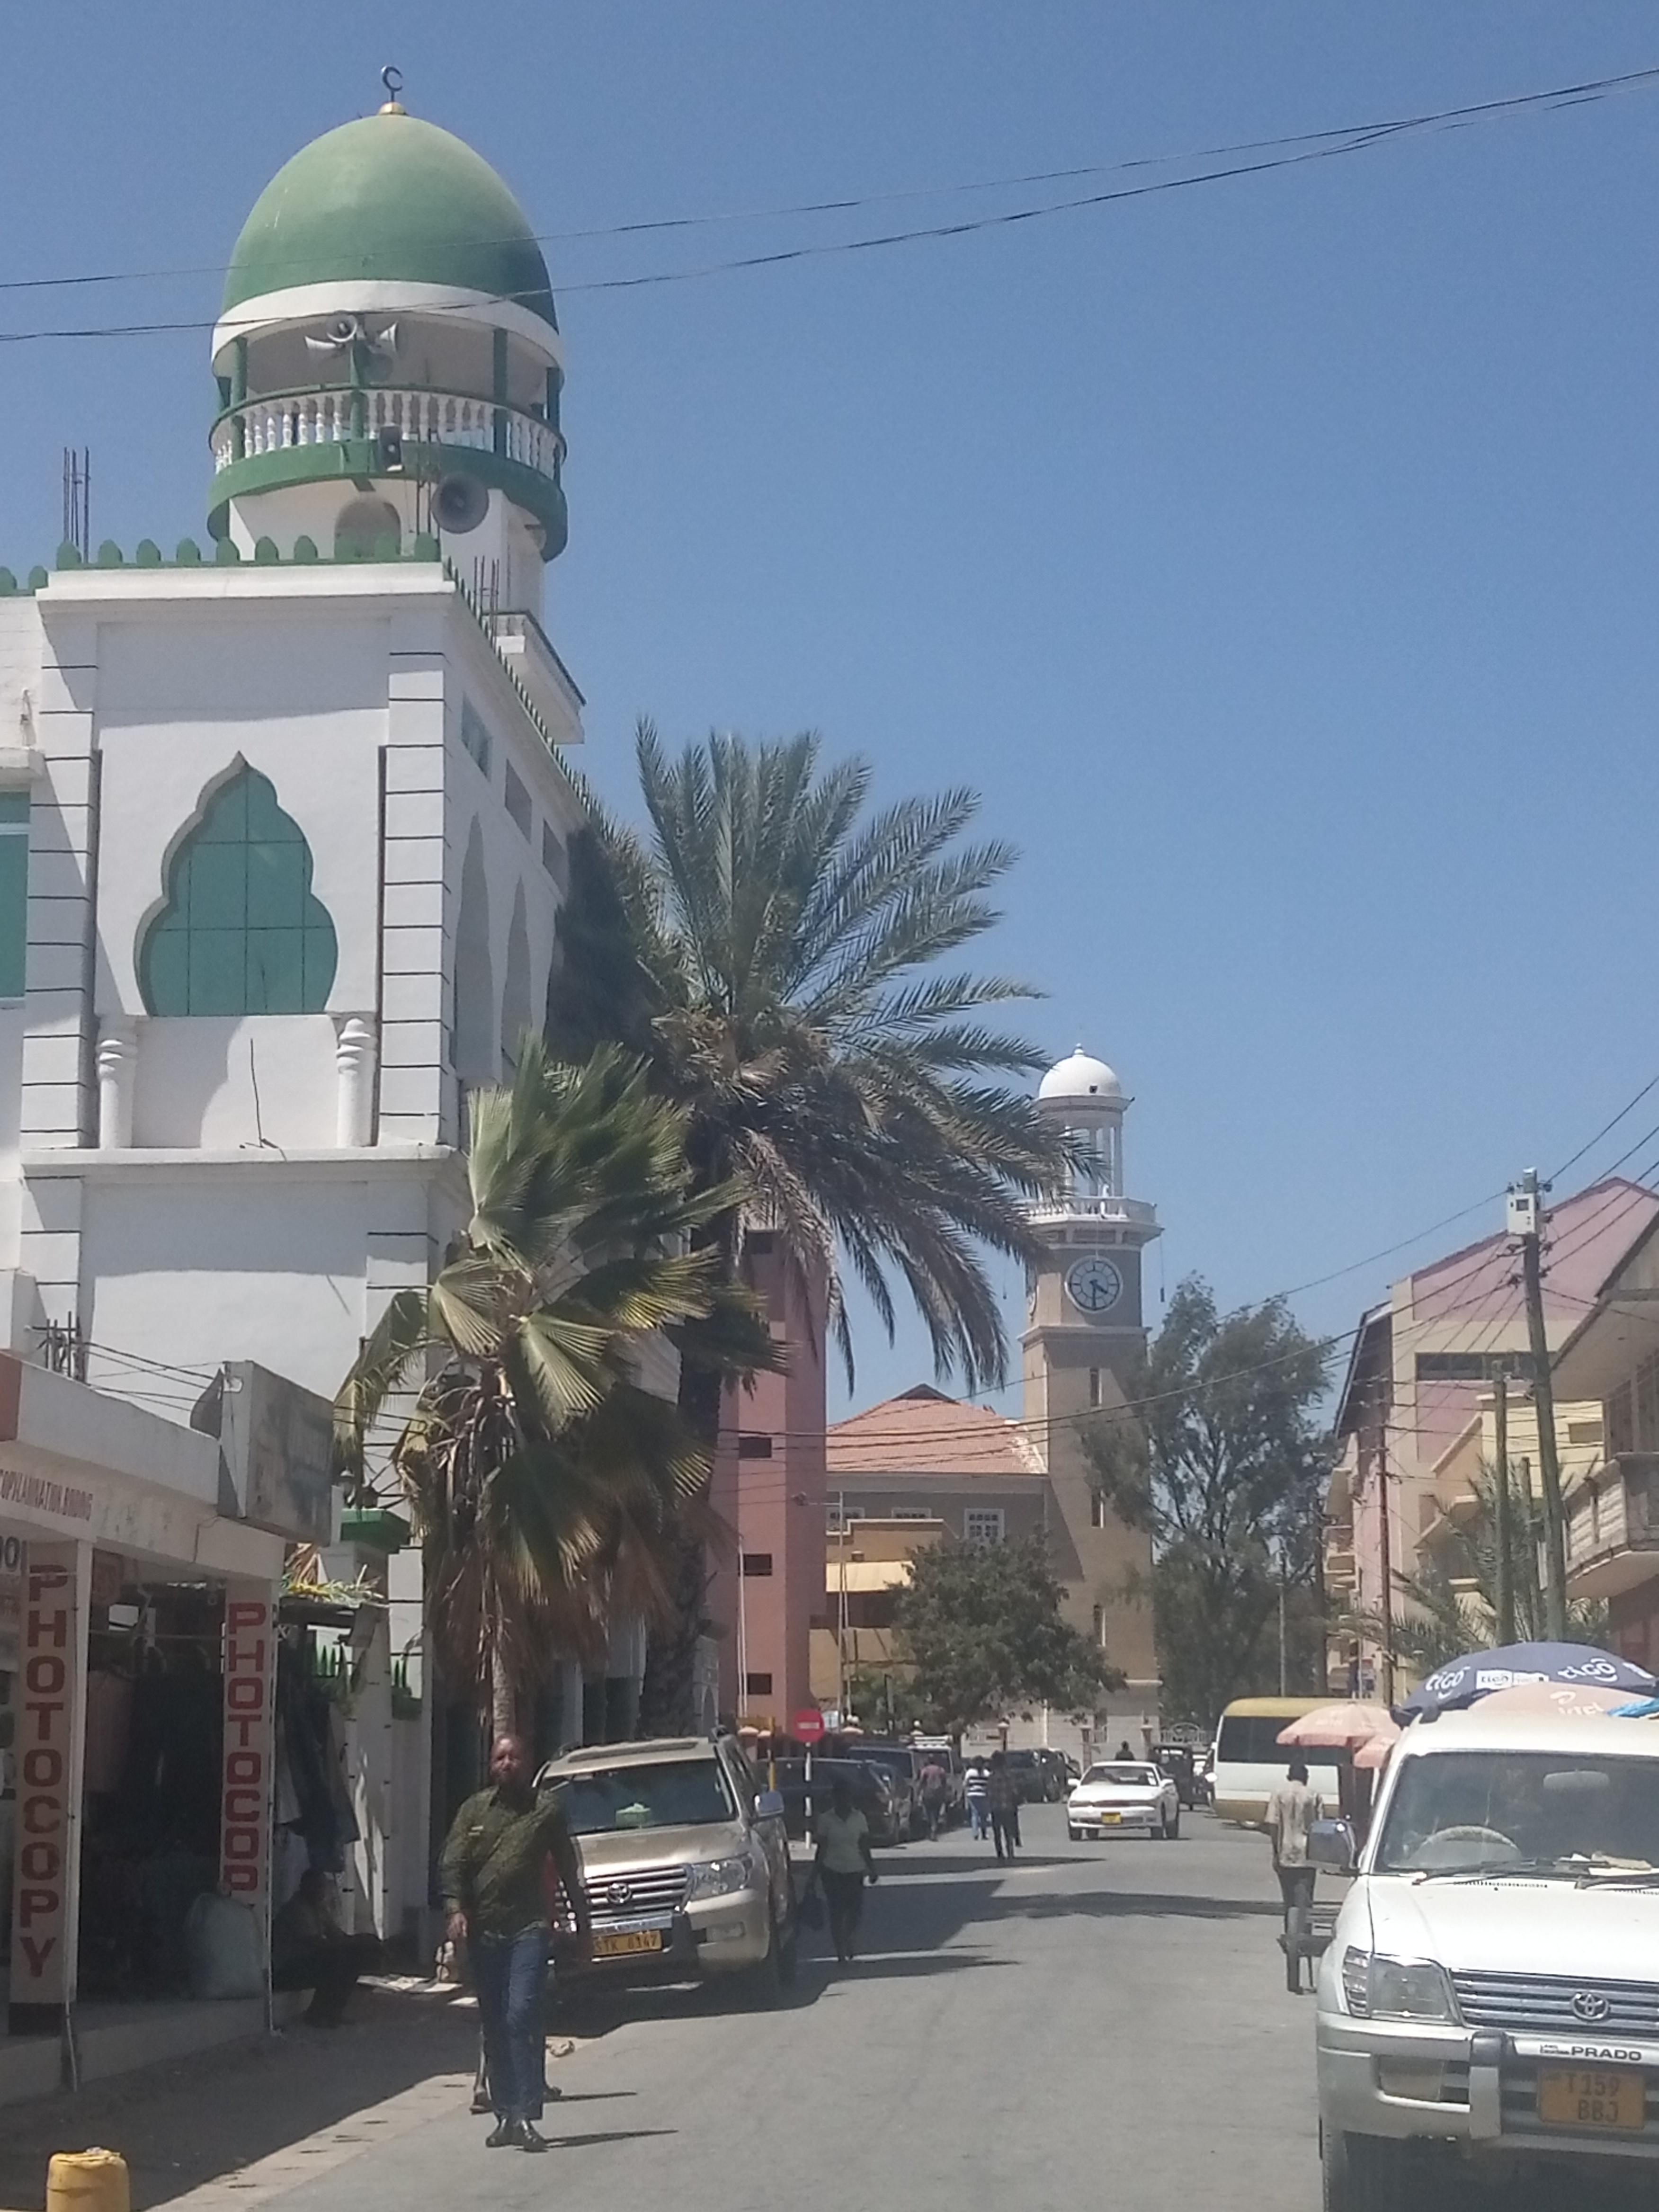 Straße in Dodomas Innenstadt